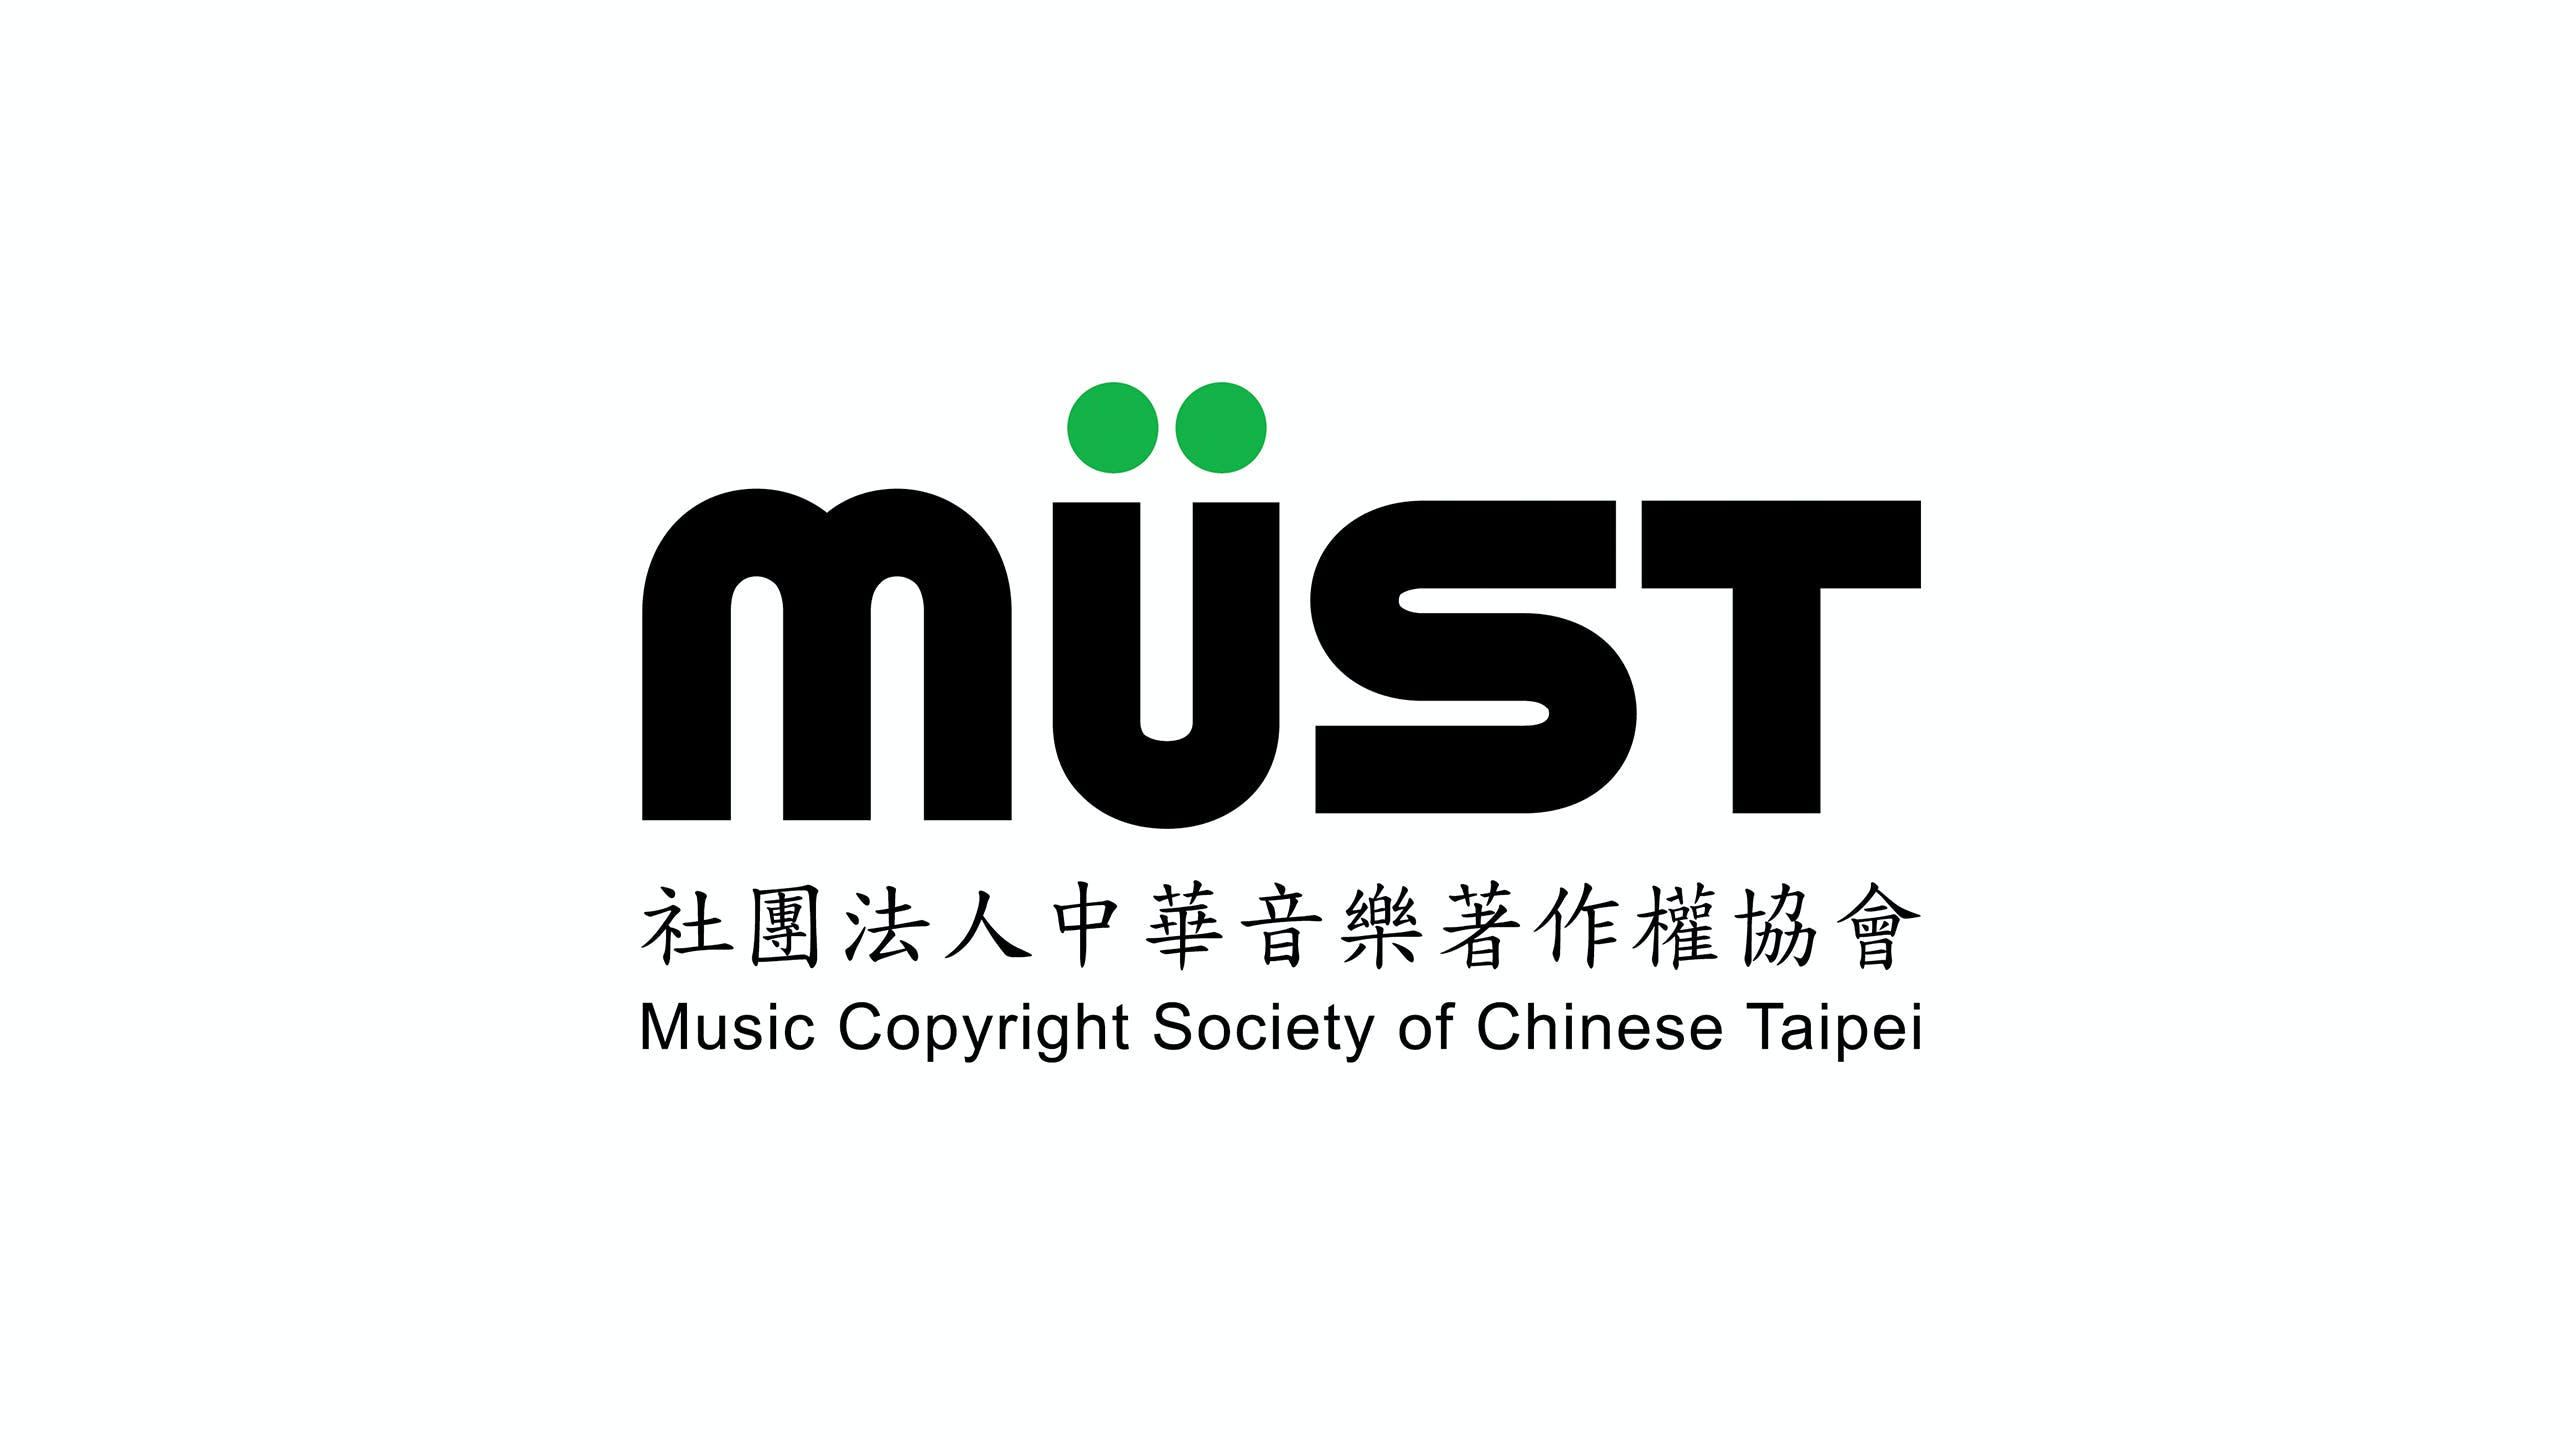 MÜST 社團法人中華音樂著作權協會